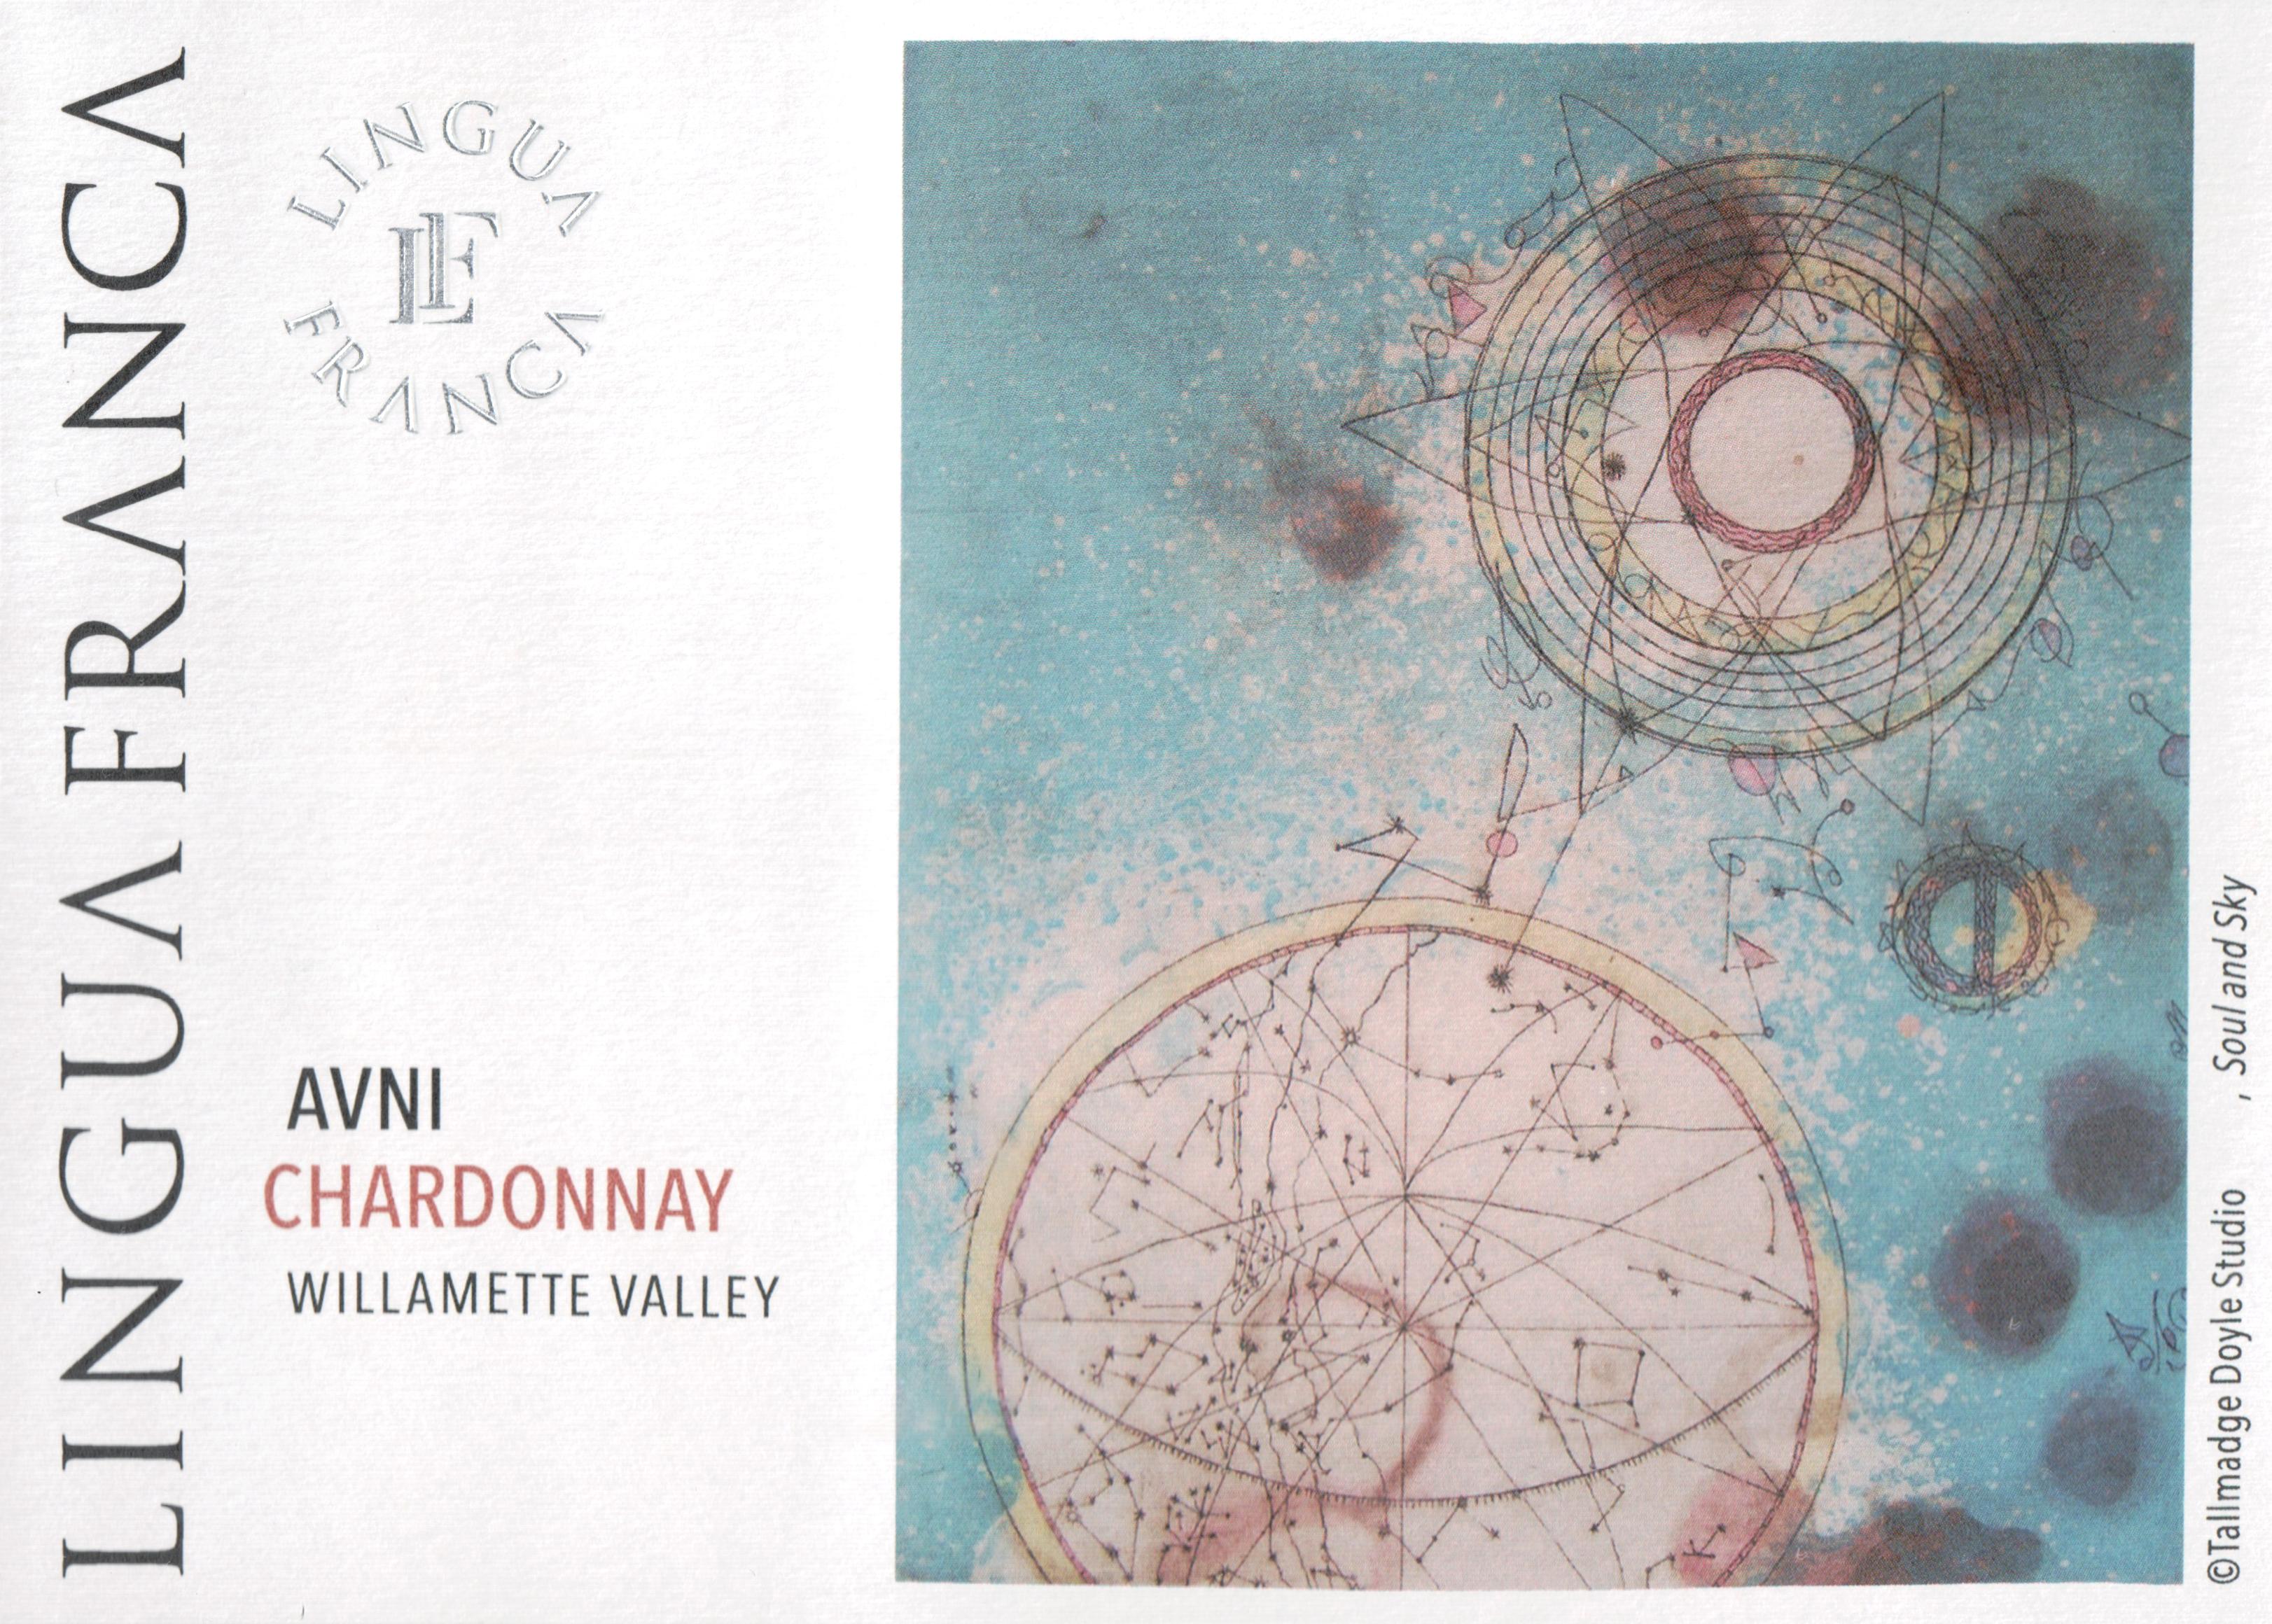 Lingua Franca Chardonnay Avni 2018